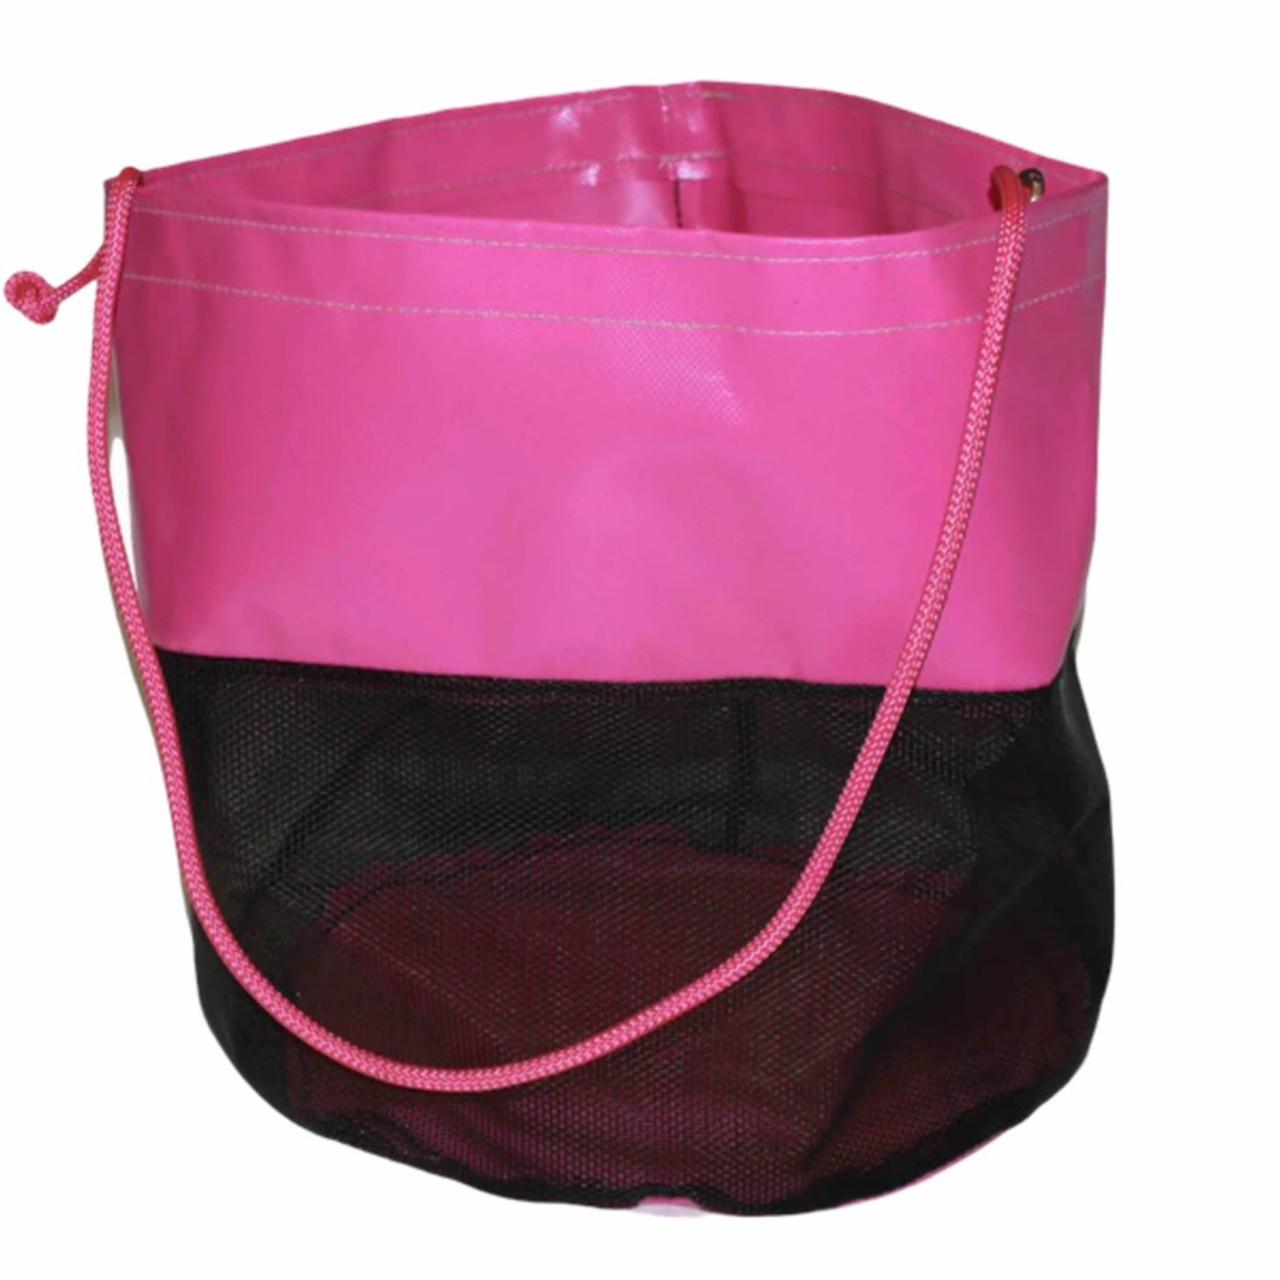 Mesh Nose Bag 30cm x 34cm H Australian Made pvc gear bags